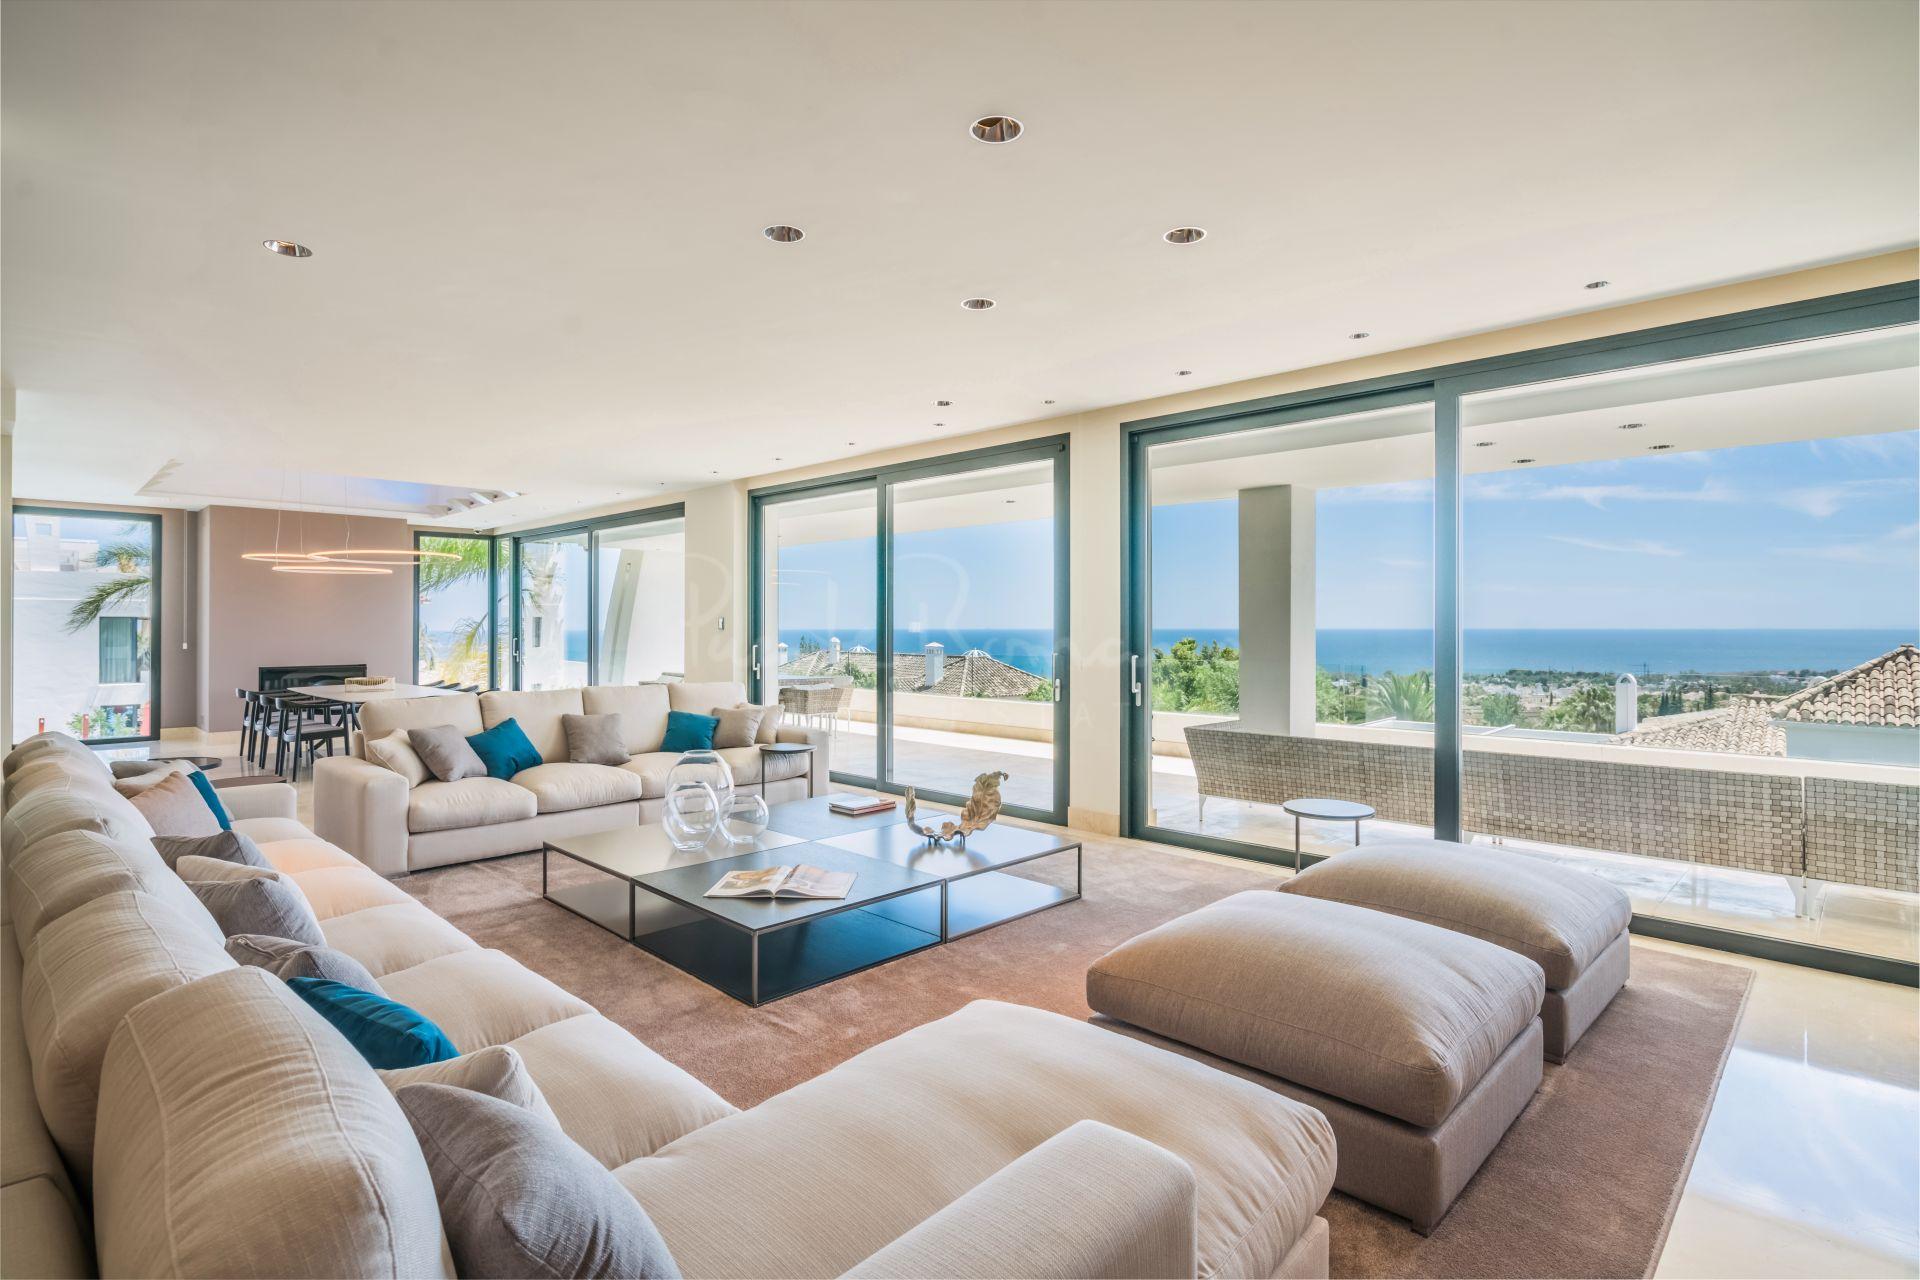 Penthouse in Reserva de Sierra Blanca, Marbella